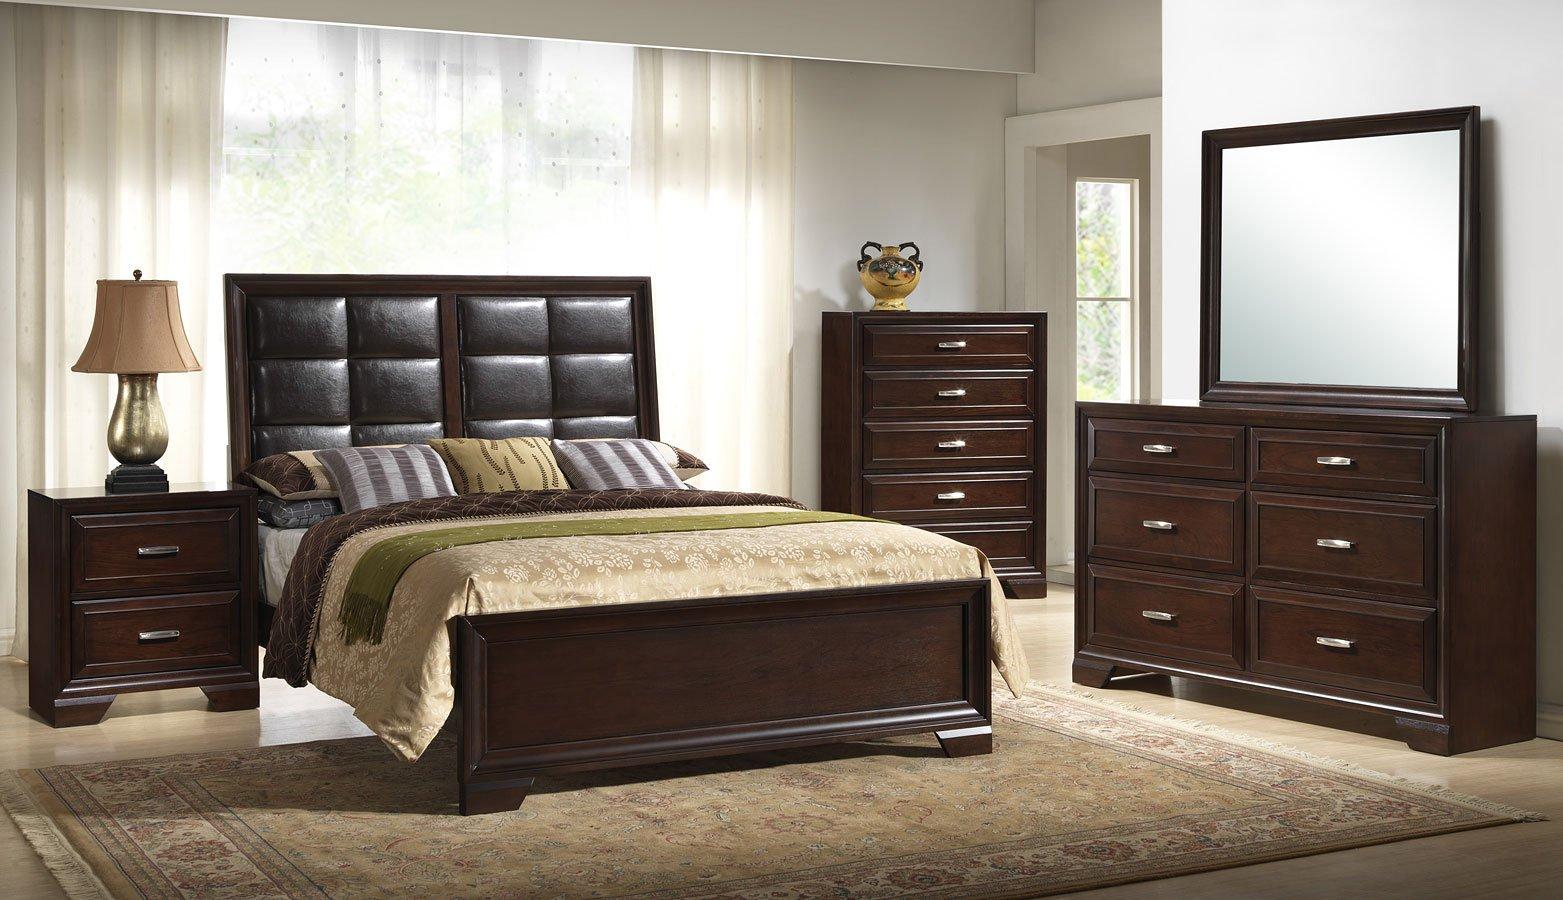 Jacob Panel Bedroom Set Bedroom Sets Bedroom Furniture Bedroom